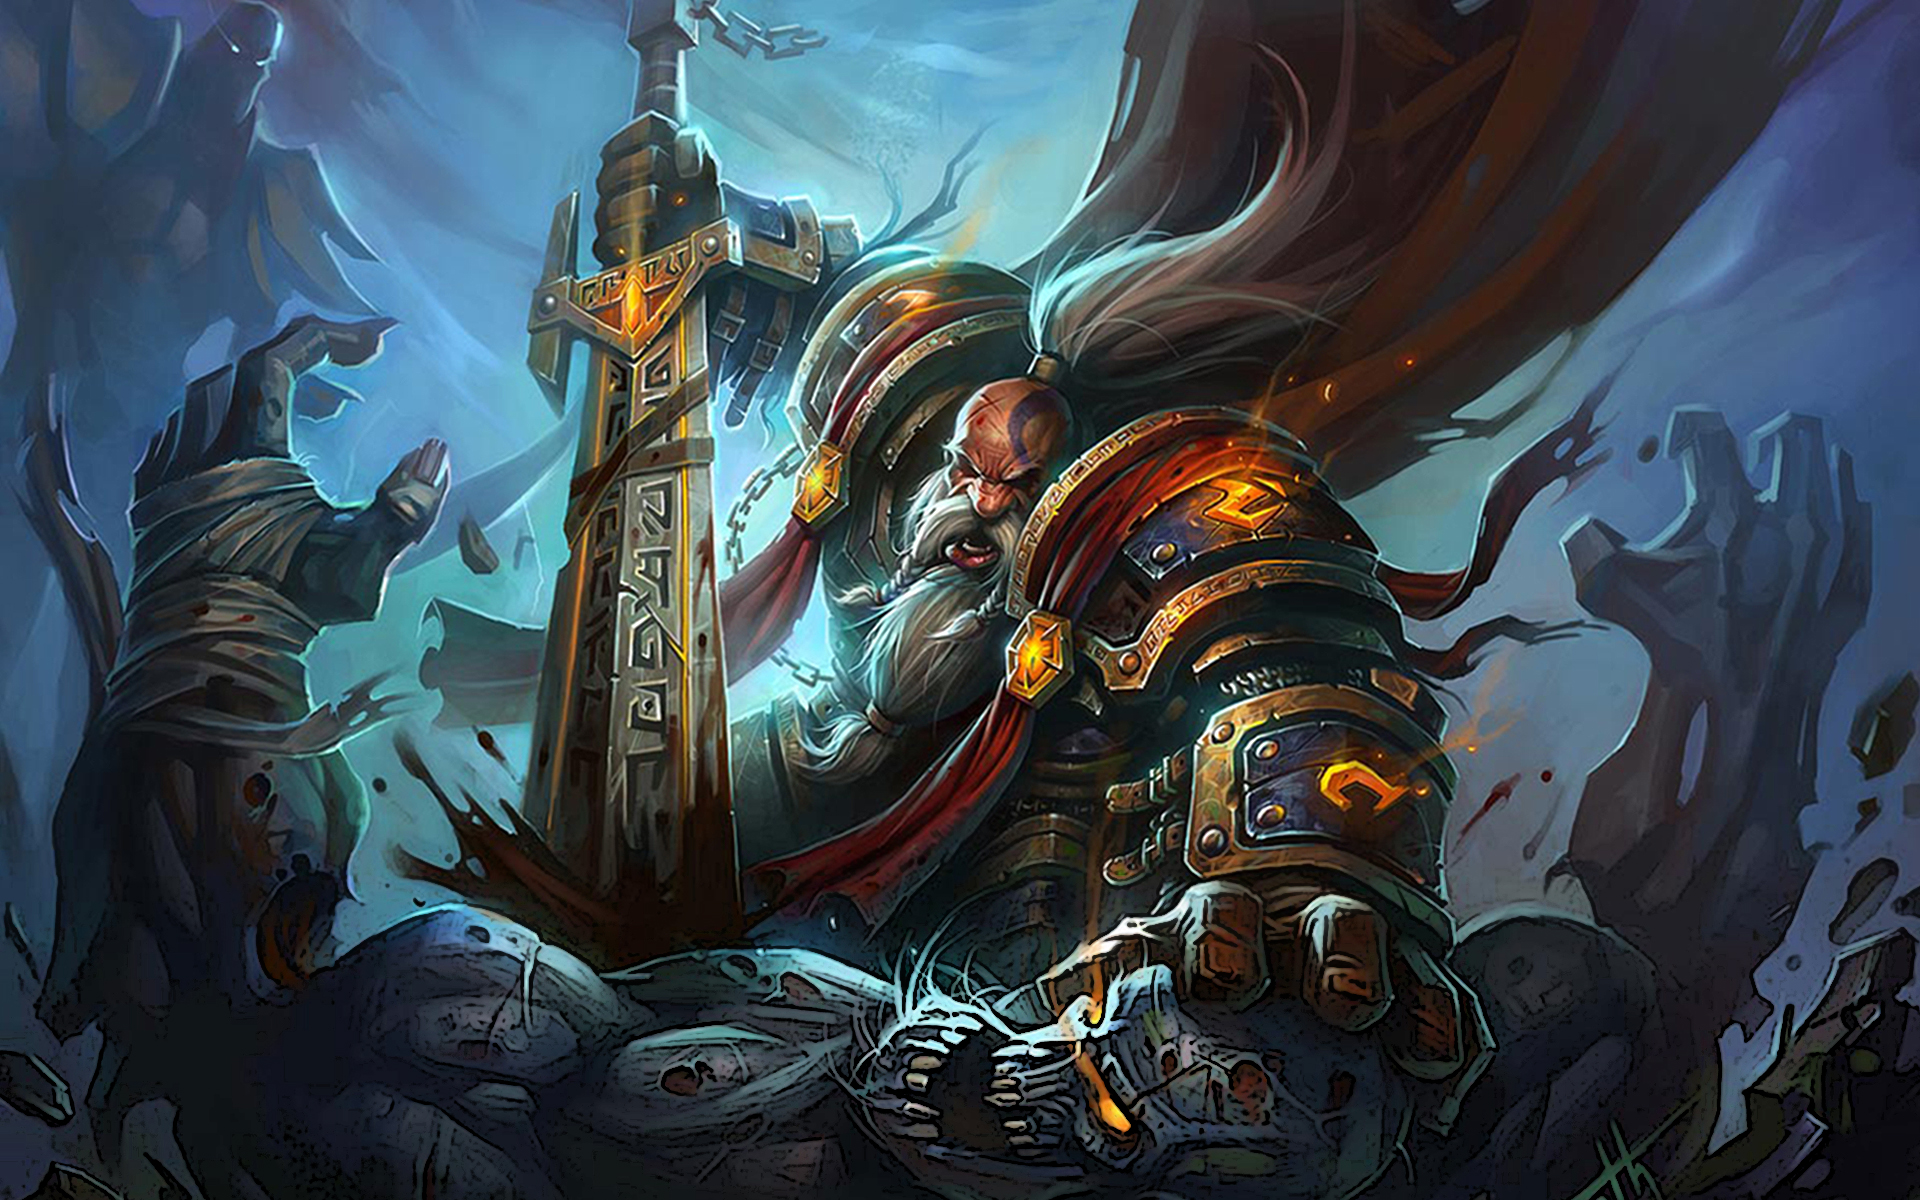 World Of Warcraft Alliance Wallpaper Group (0+)